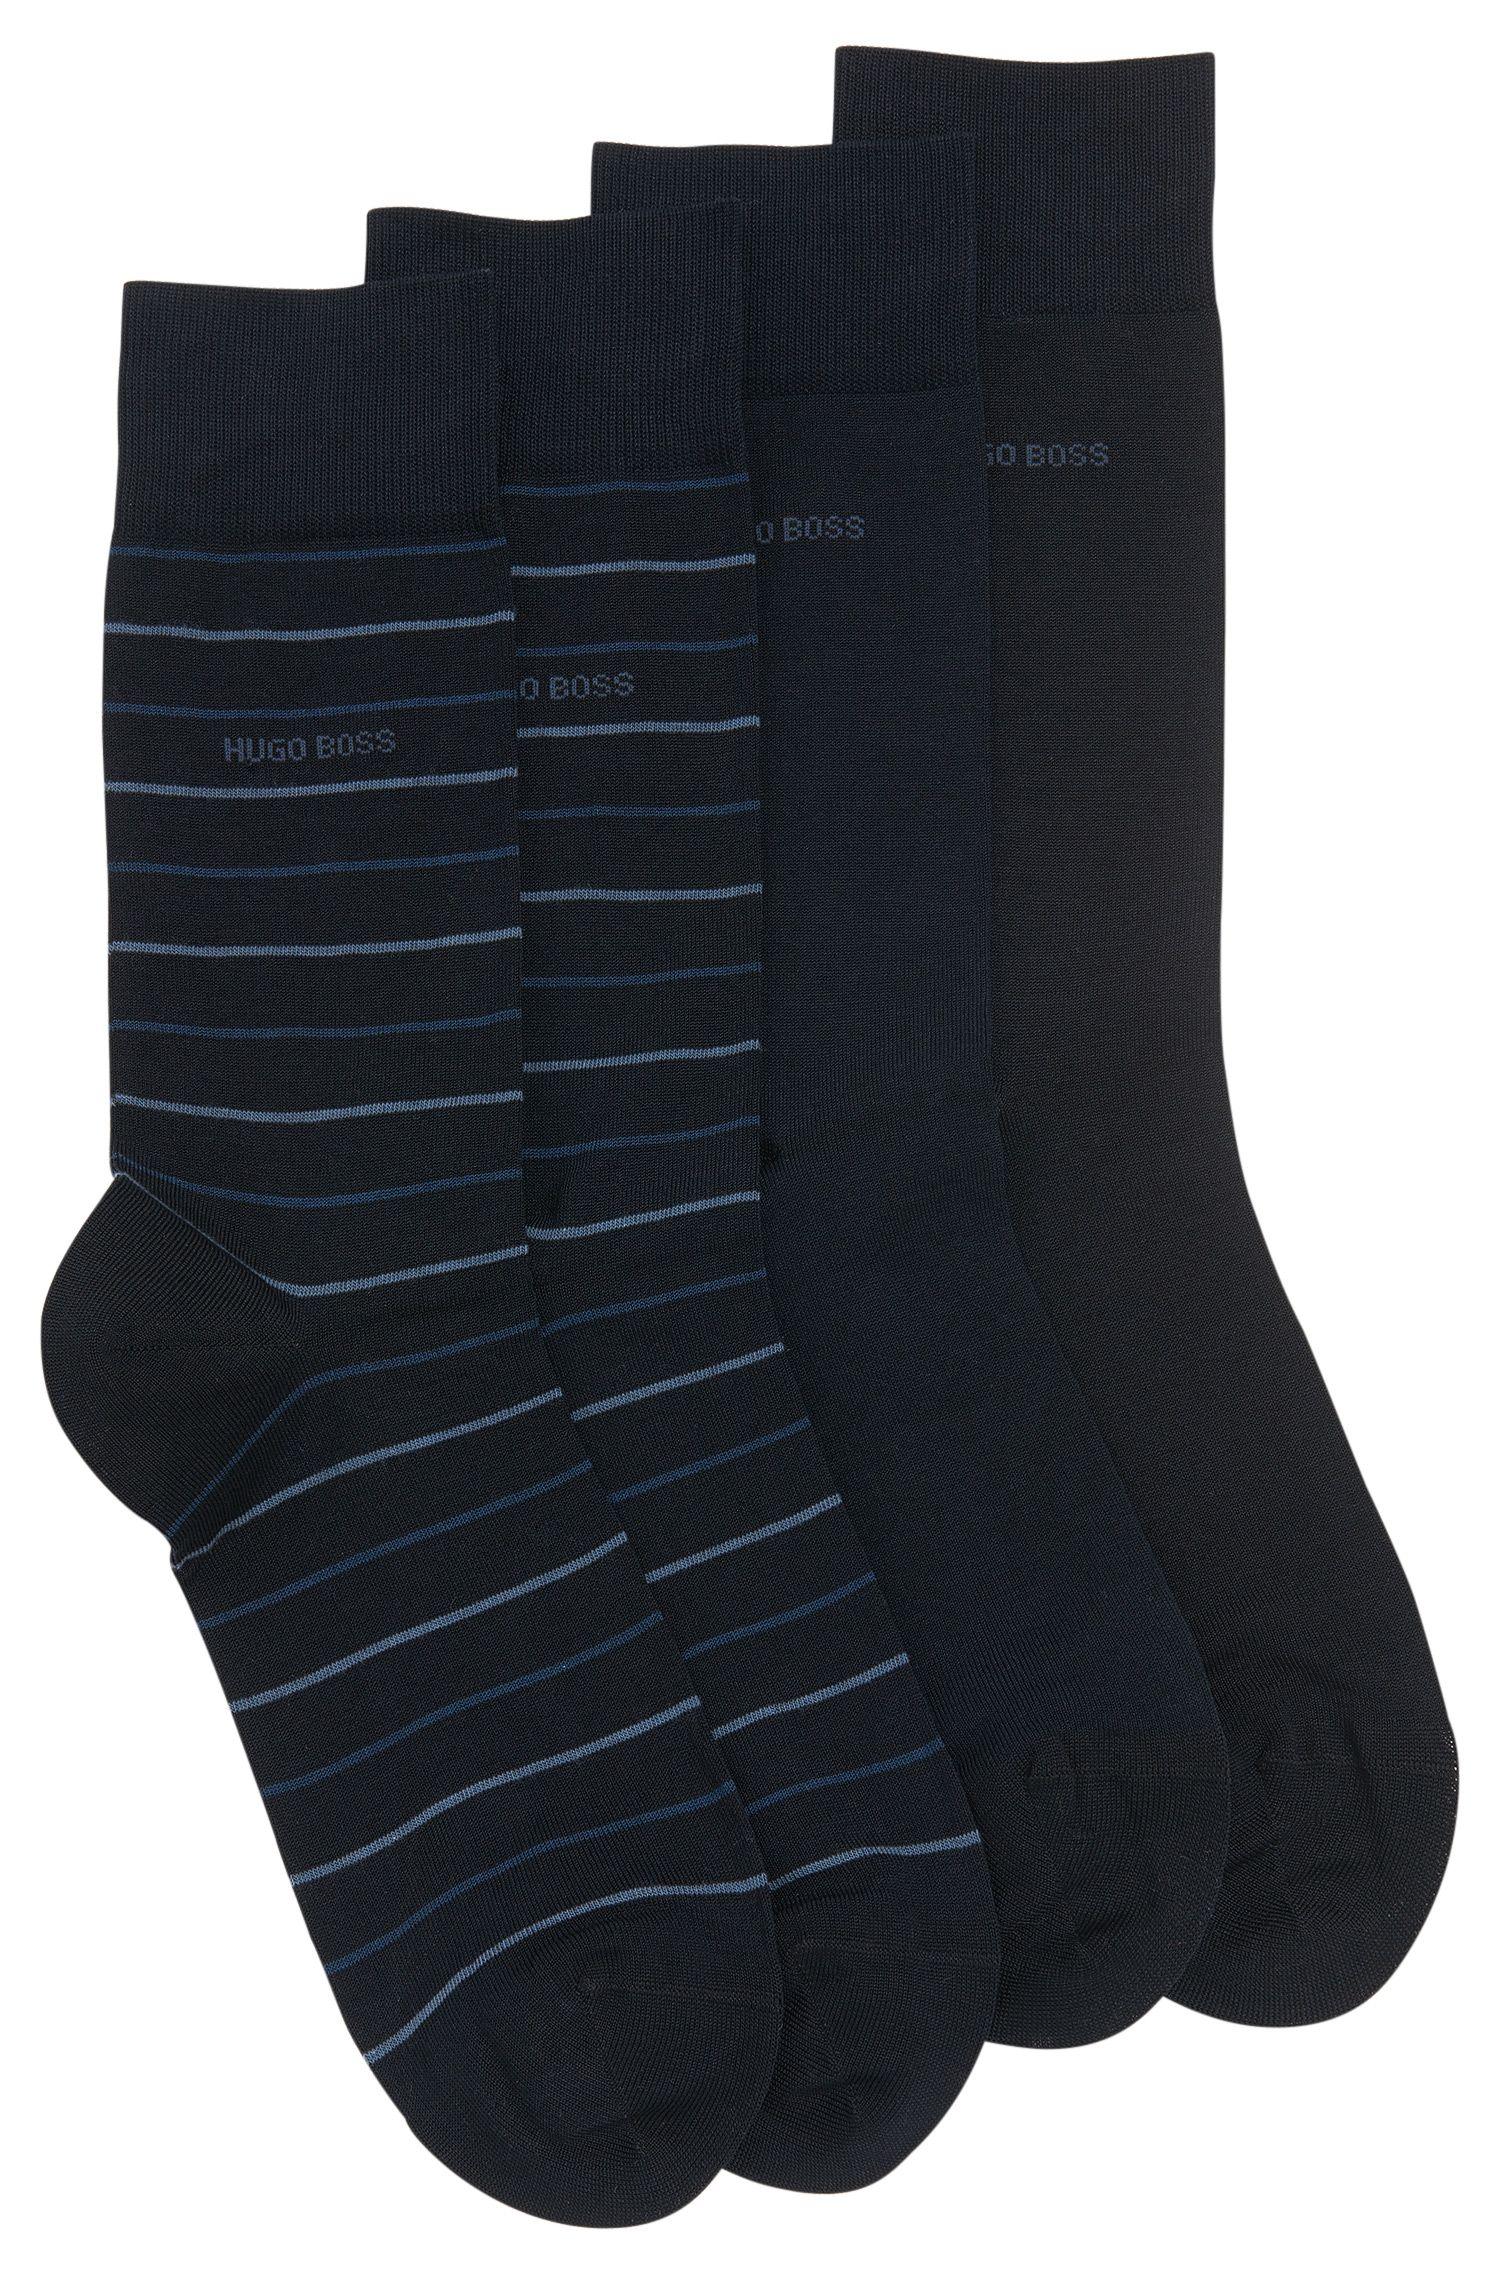 Set van twee paar sokken met normale lengte